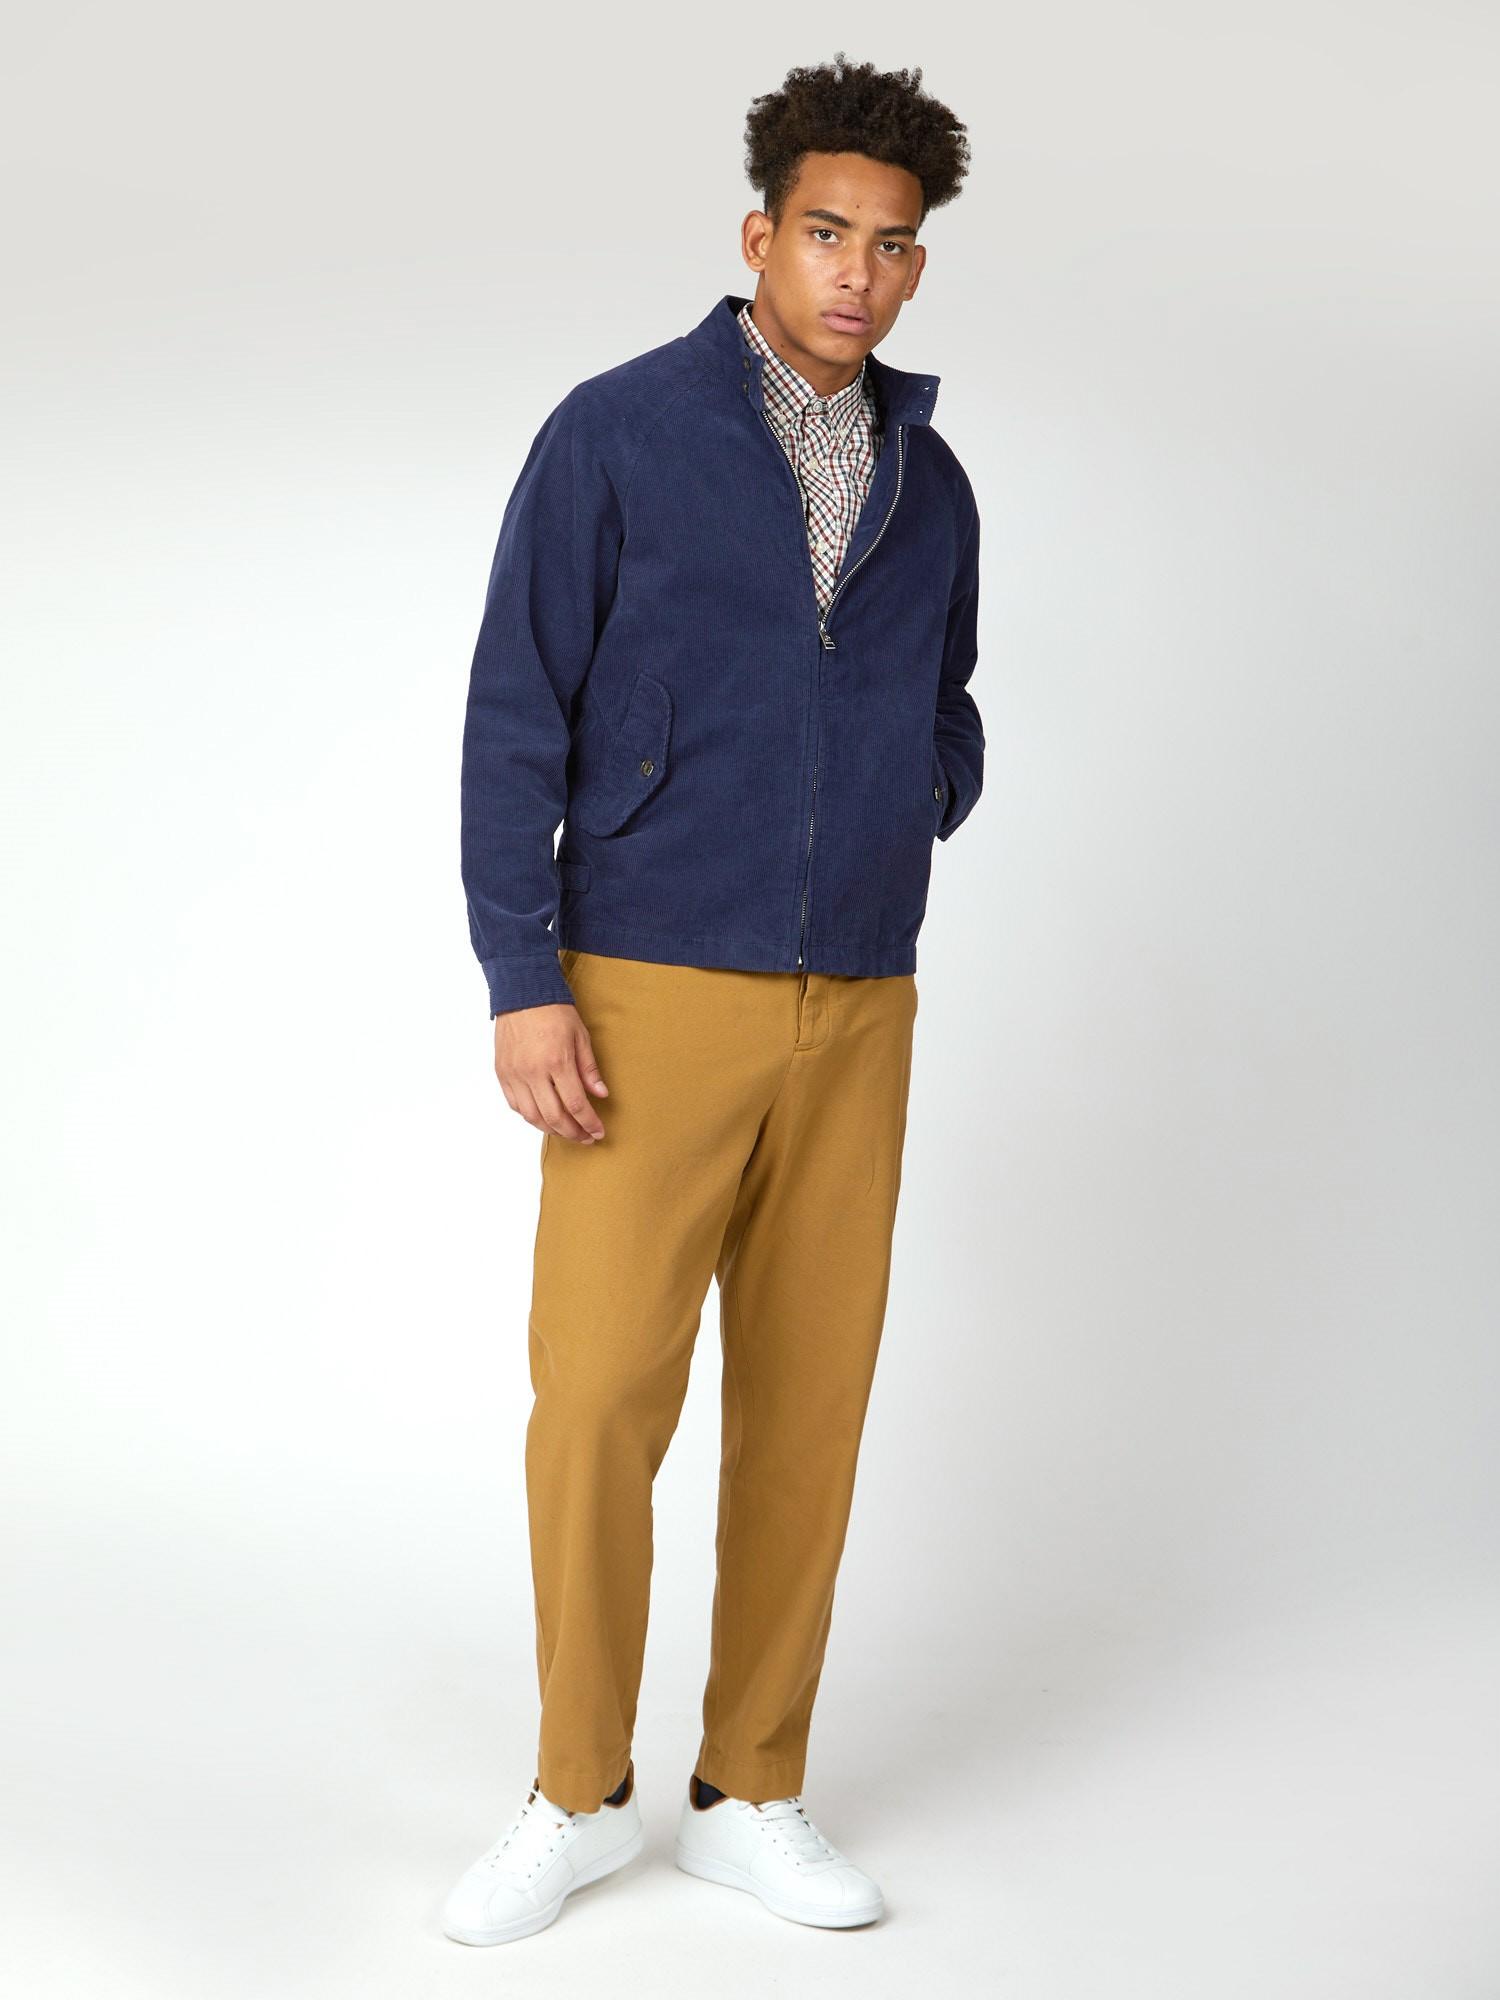 Ben Sherman Navy Blue Cord Harrington Jacket